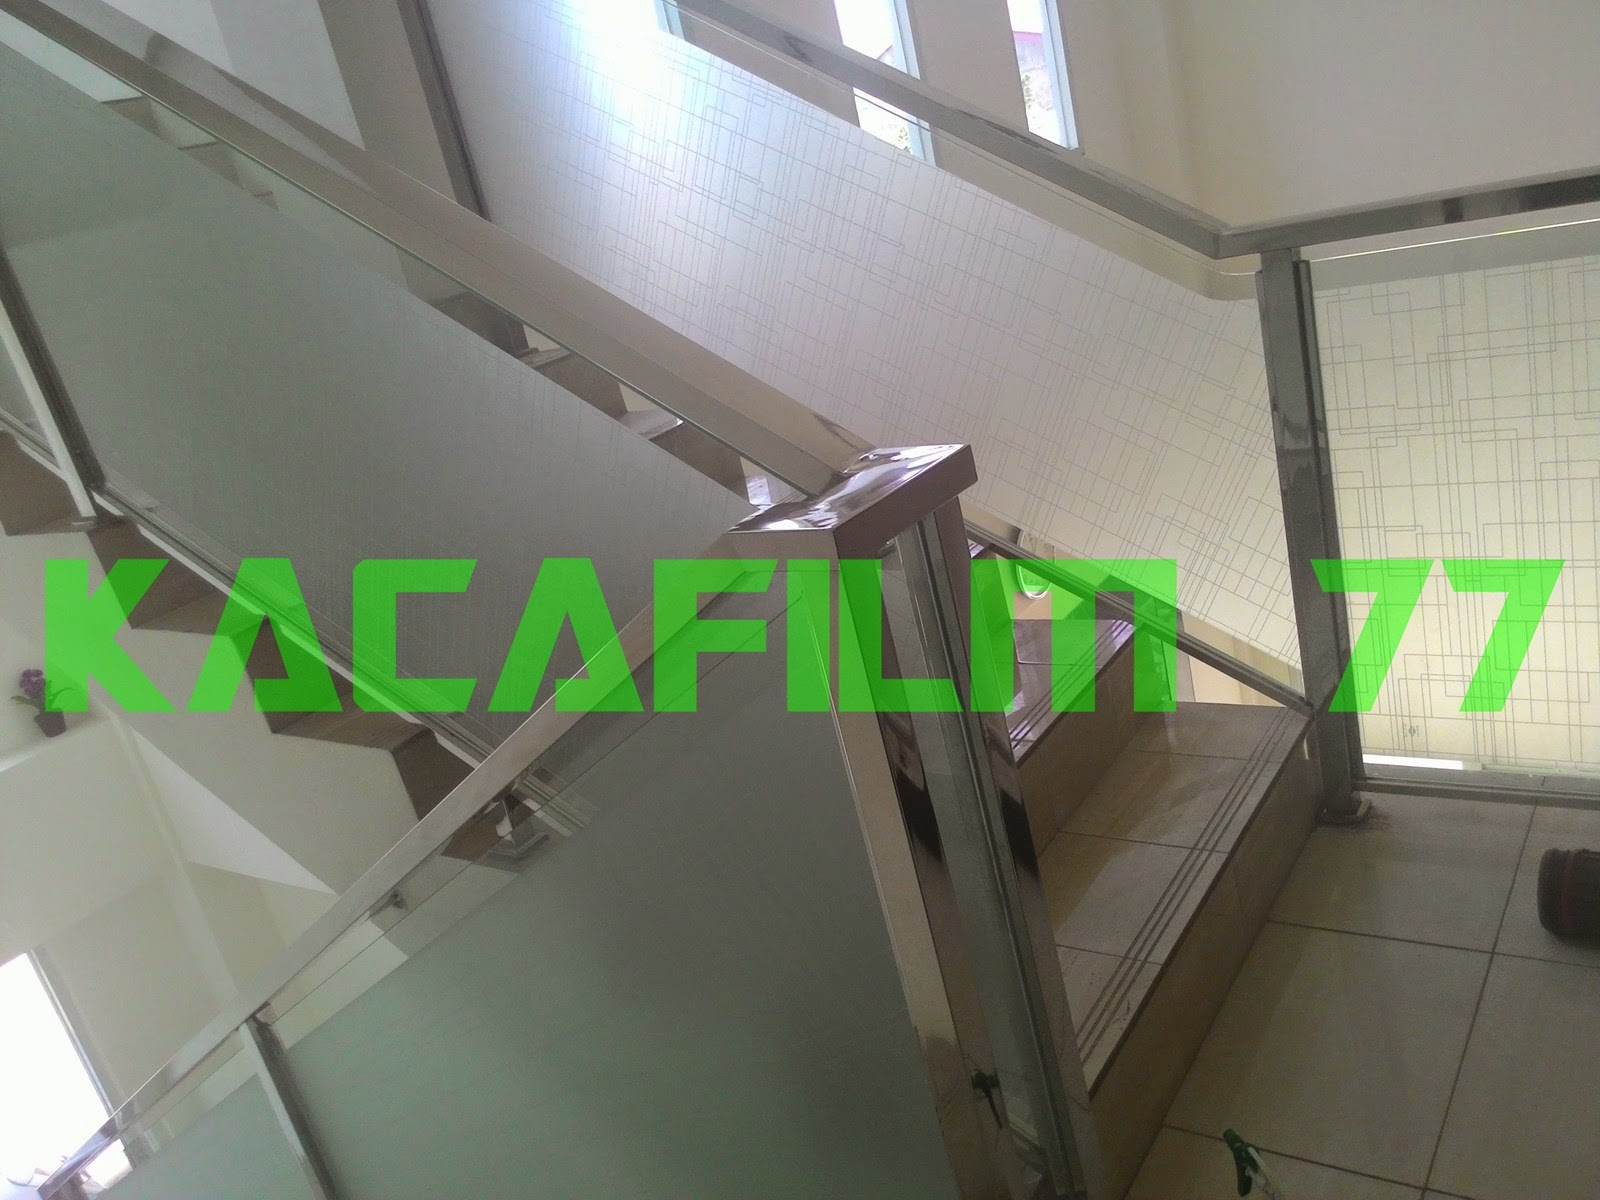 http://1.bp.blogspot.com/-AvouZYXdusU/VRKlr-25yFI/AAAAAAAAtQA/VFs_wrMbrzk/s1600/P_20140922_125831dfhy77.jpg